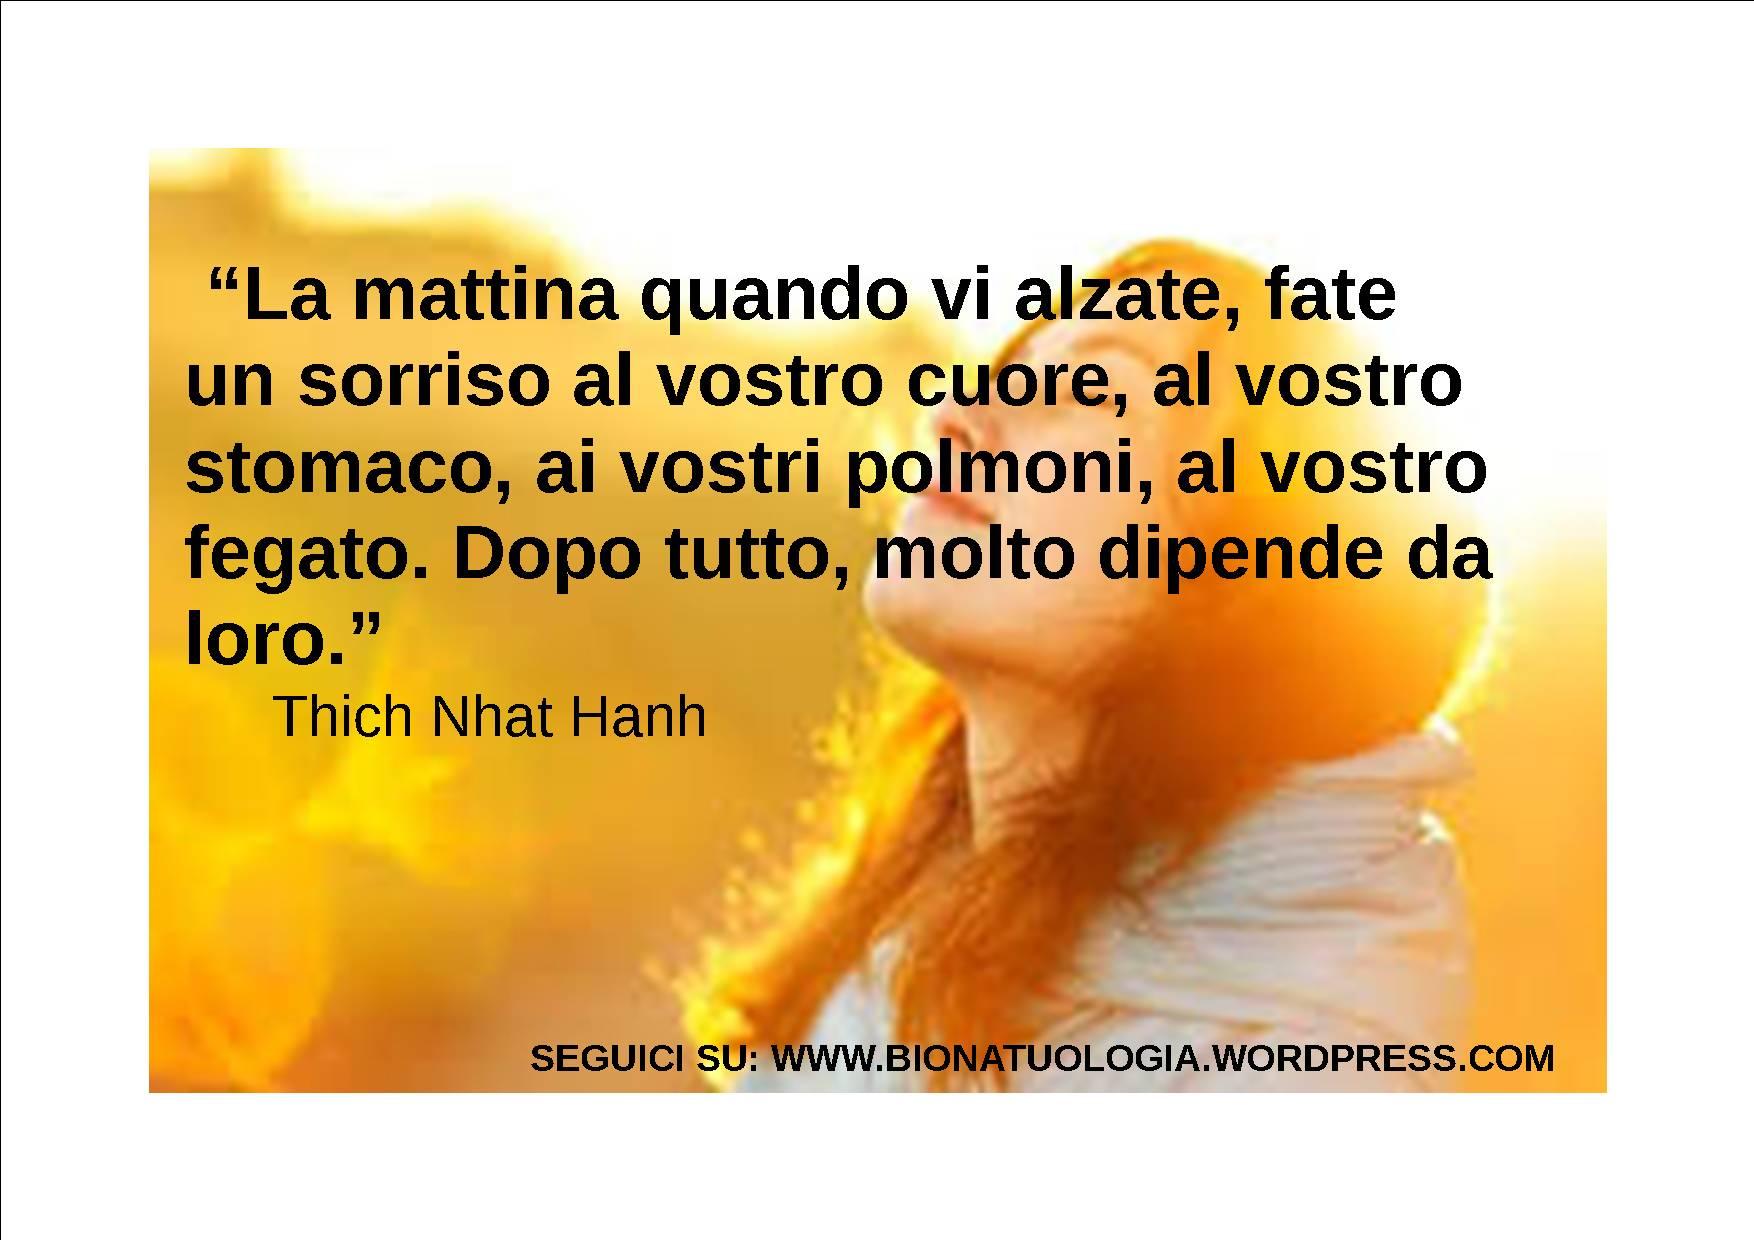 Ben noto FRASI Thich Nhat Hanh | BIONATUROLOGIA© RI52